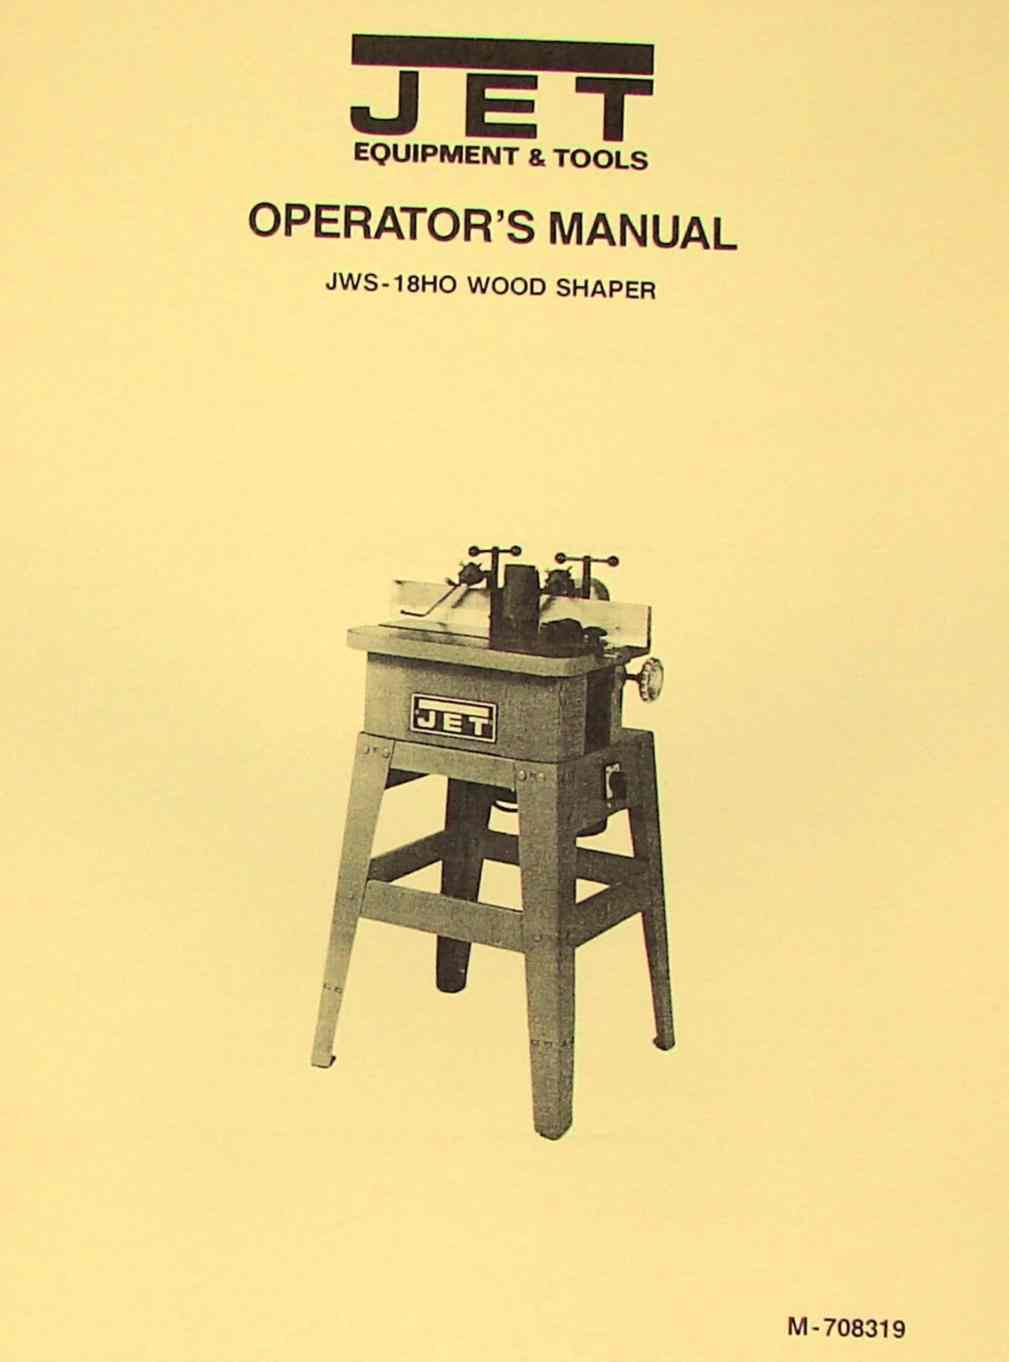 JET-Asian JWS-18HO Wood Shaper Operator's & Parts Manual | Ozark Tool  Manuals & Books